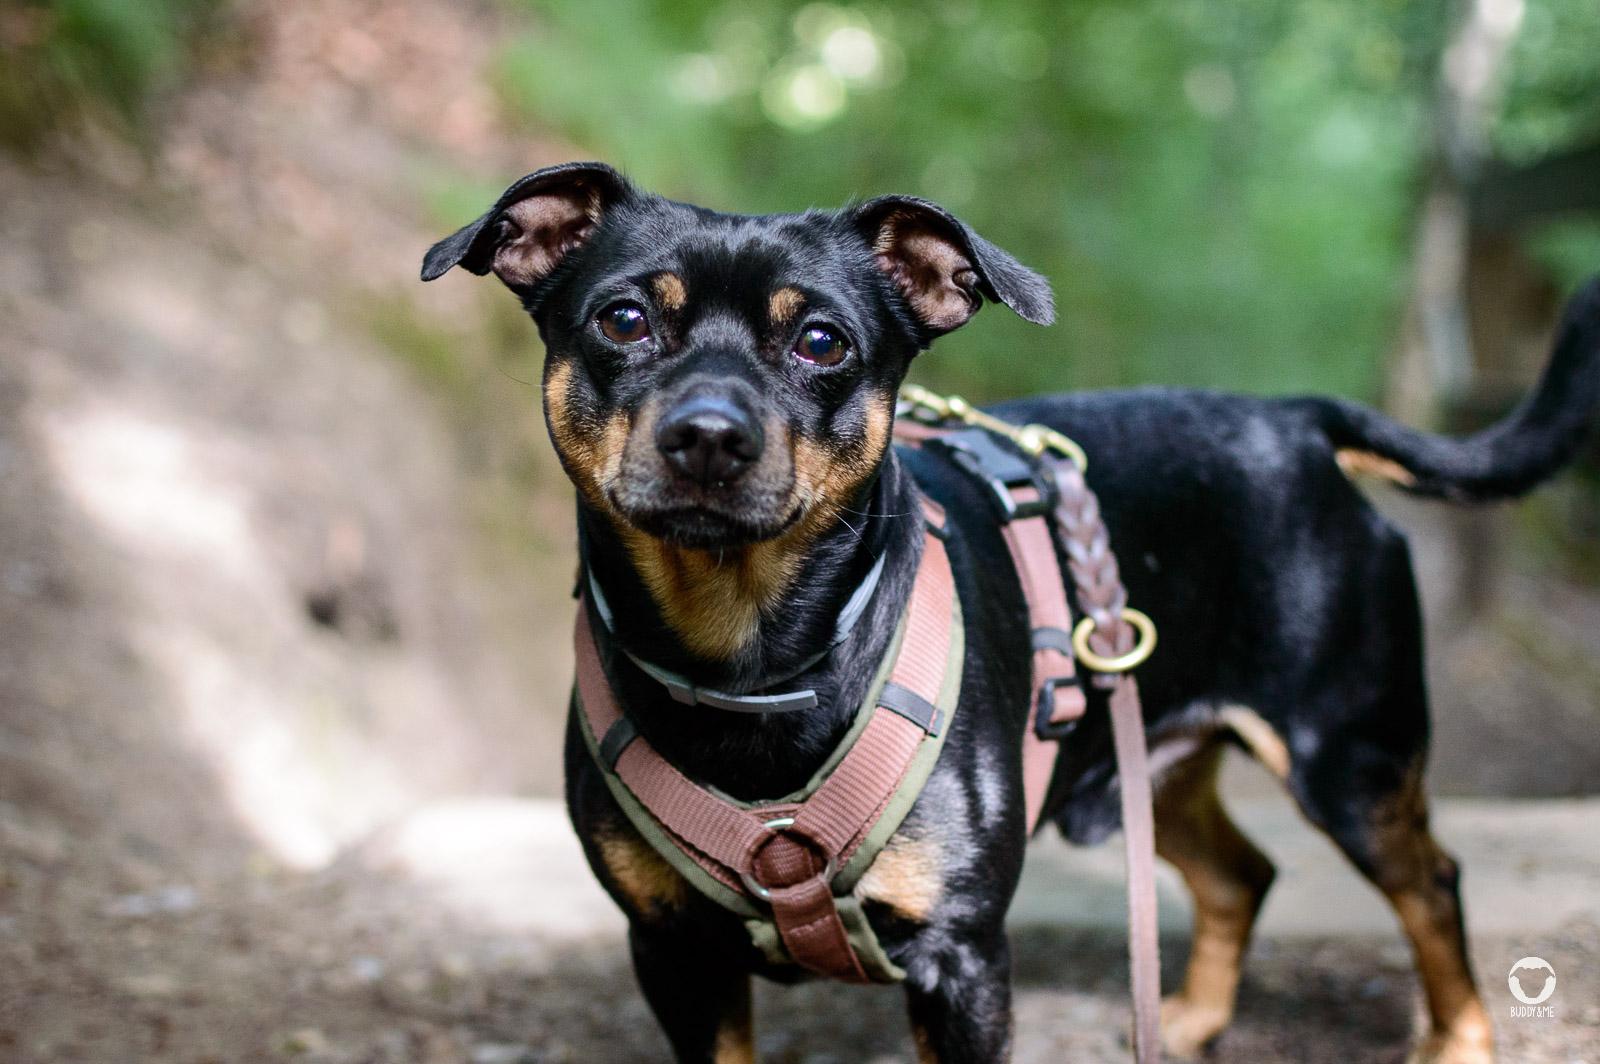 Buddy unterwegs im Neandertal | Pinscher Buddy, Buddy and Me, Hundeblog, Dogblog, Ruhrgebiet, Leben mit Hund, Hundealltag